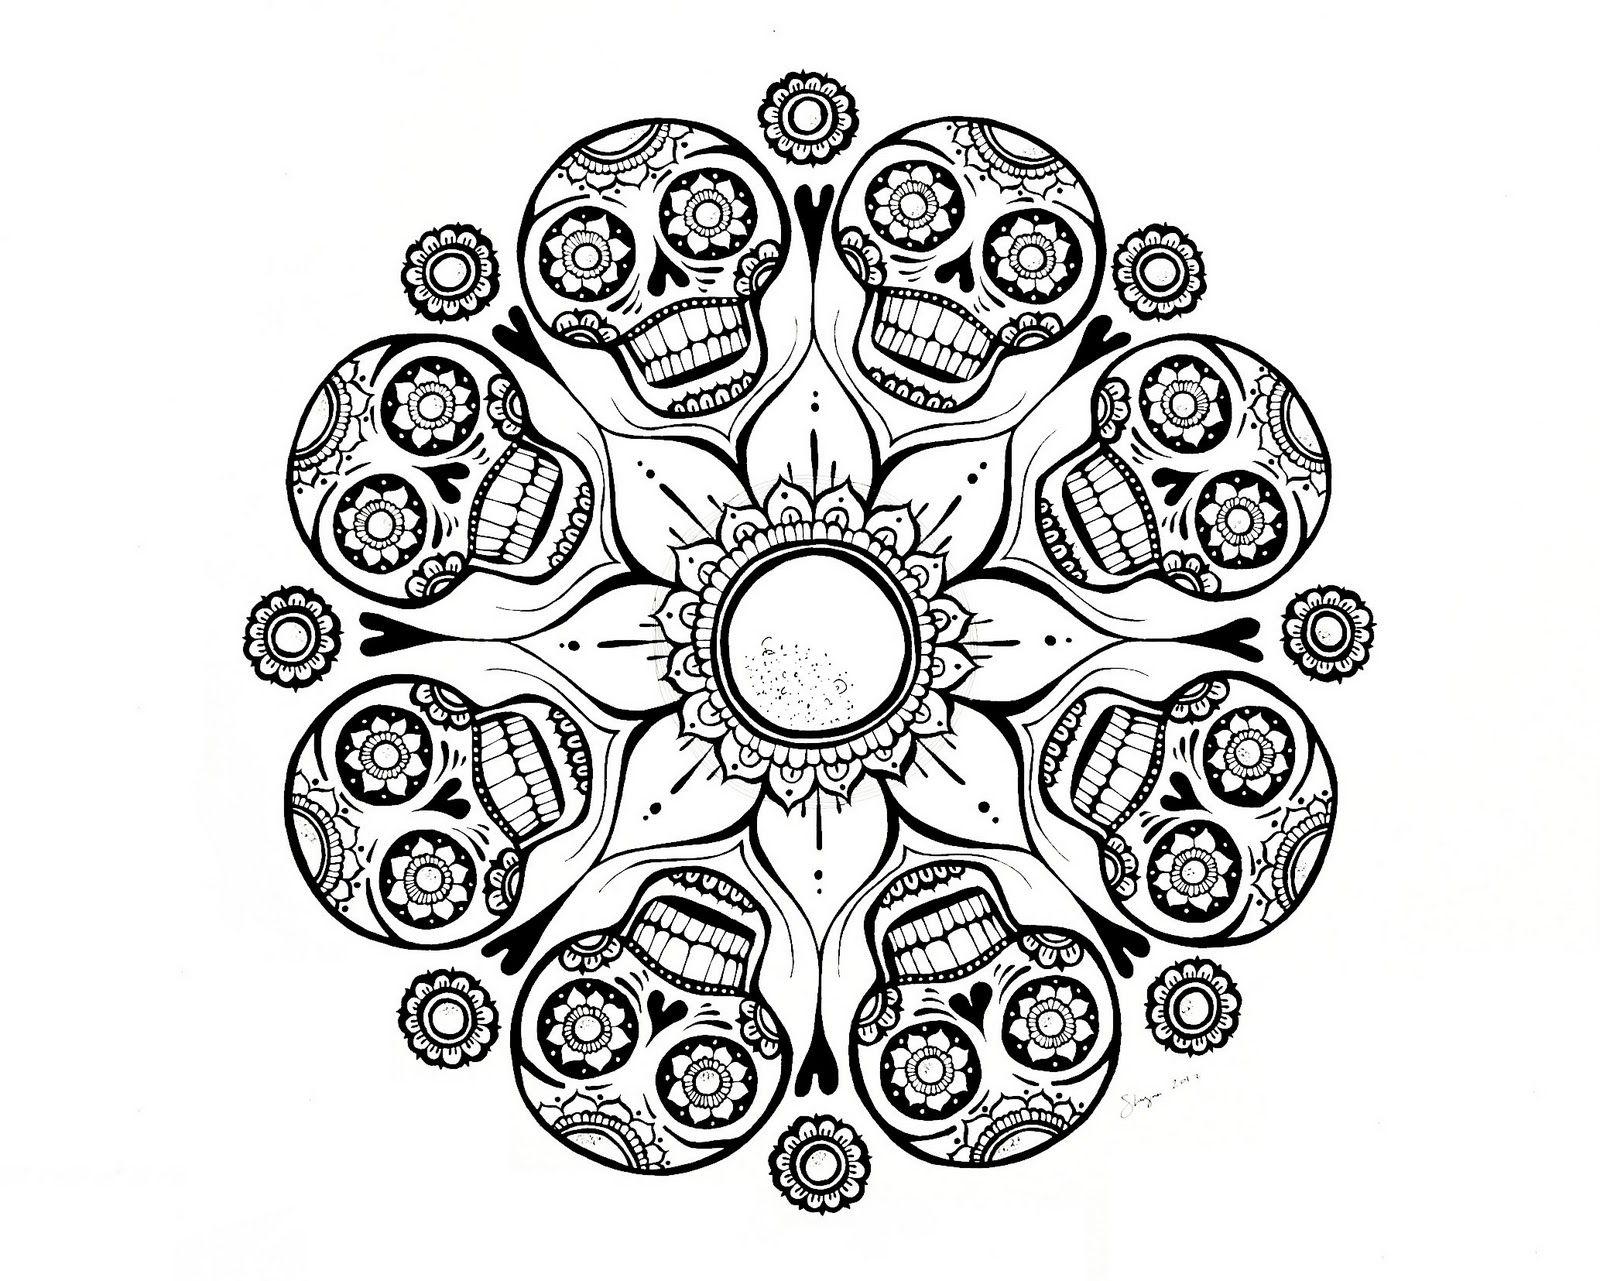 Mandala Coloring Pages On Pinterest. Skull Mandala Coloring Pages  am selling PDF downloads in my Etsy shop for 4